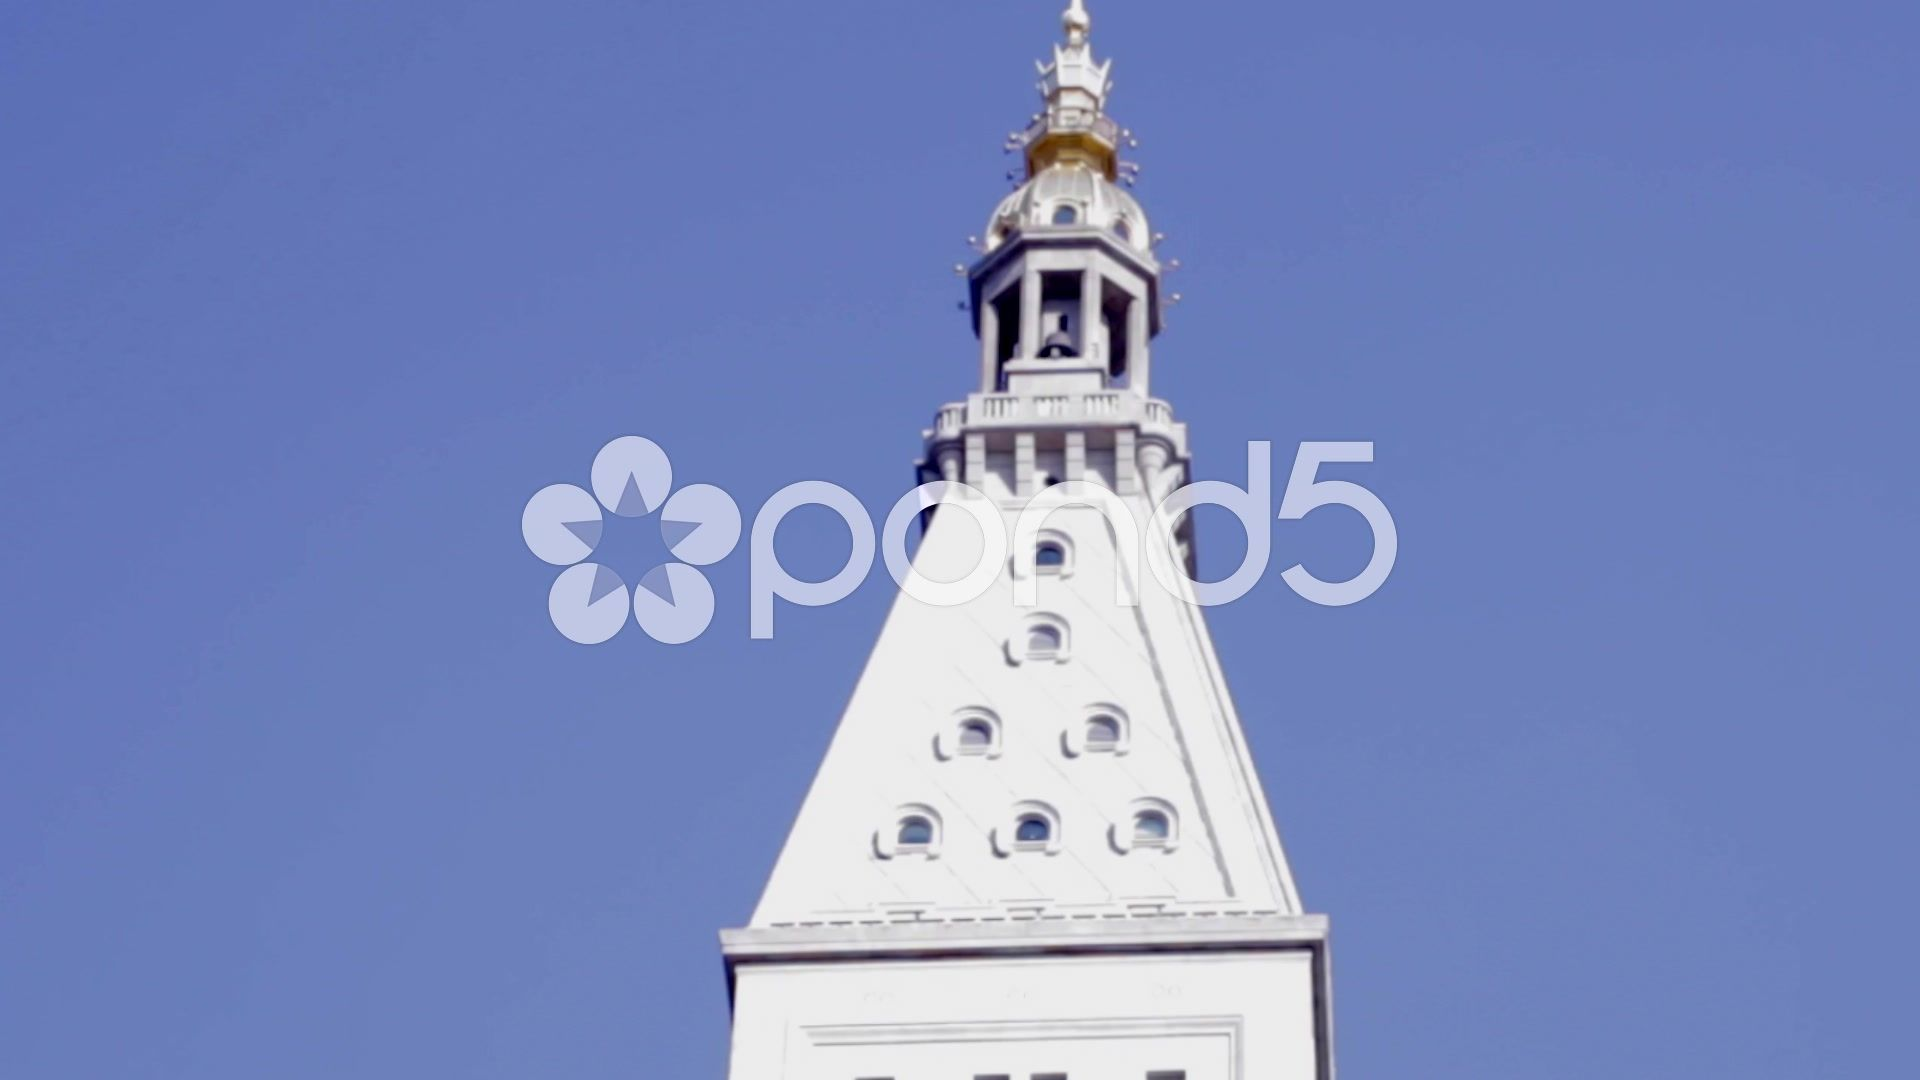 Metropolitan life insurance tower new york city madison